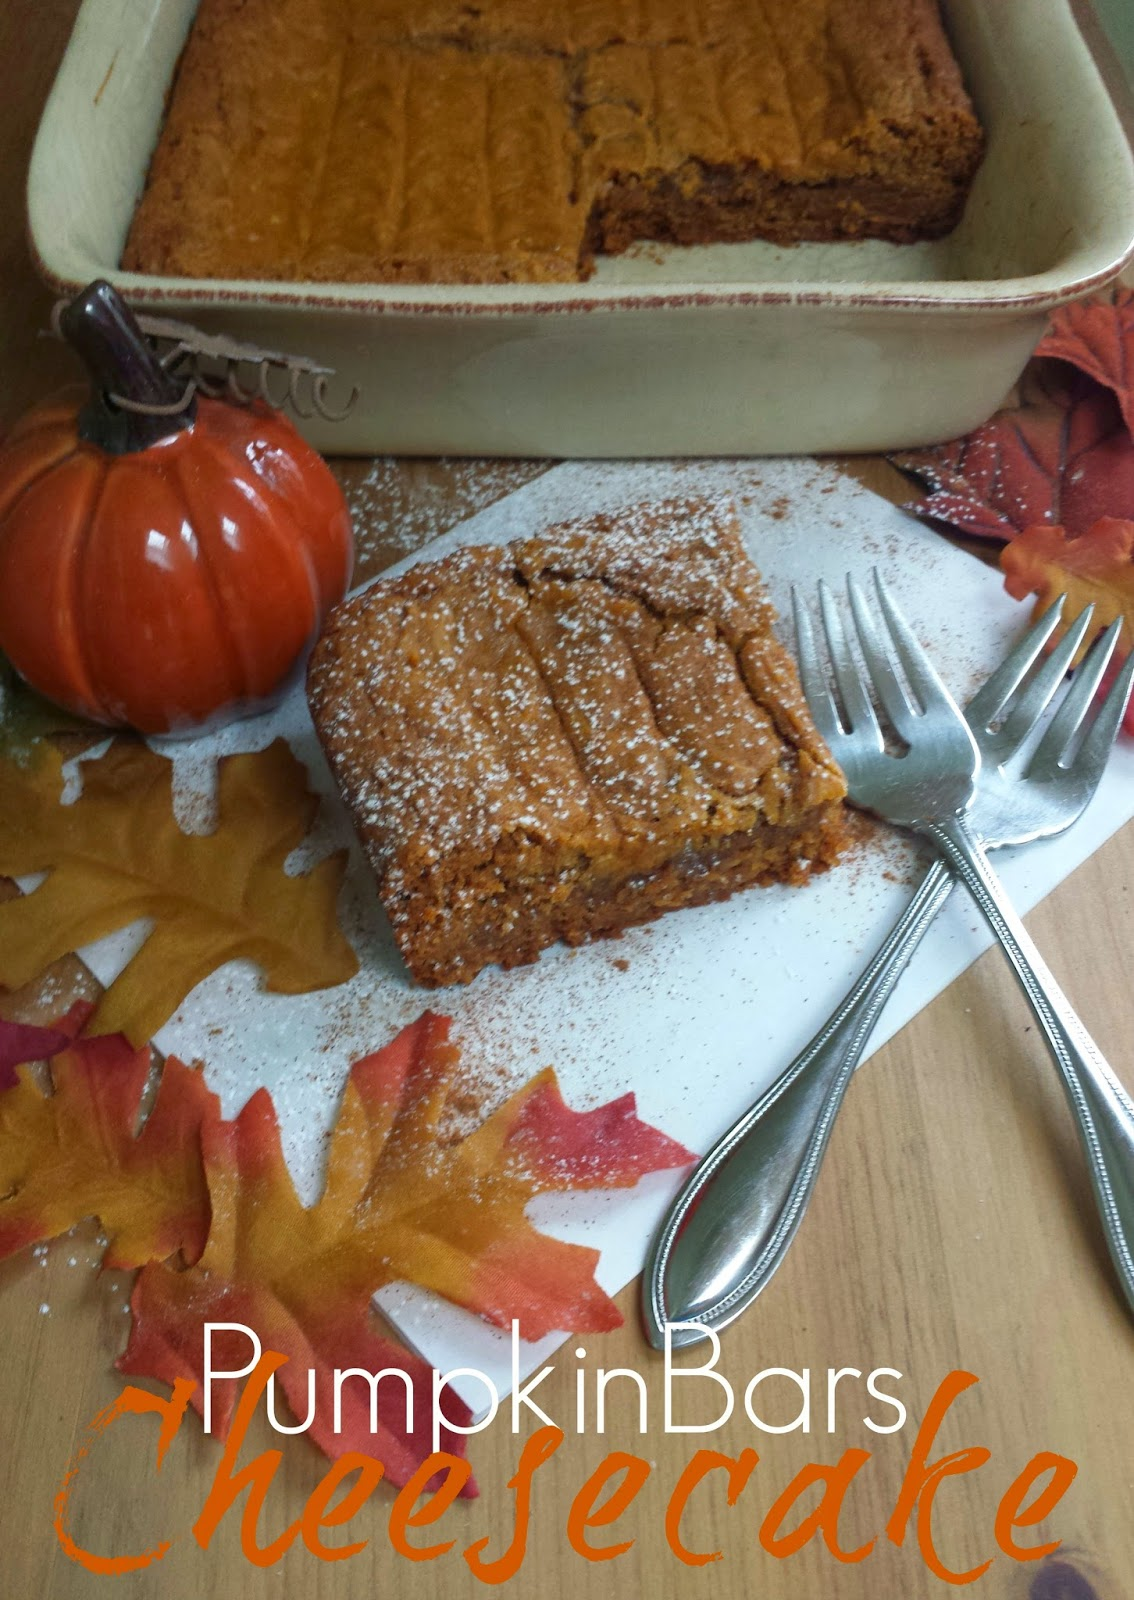 Three kids and a fish: pumpkin bars cheesecake